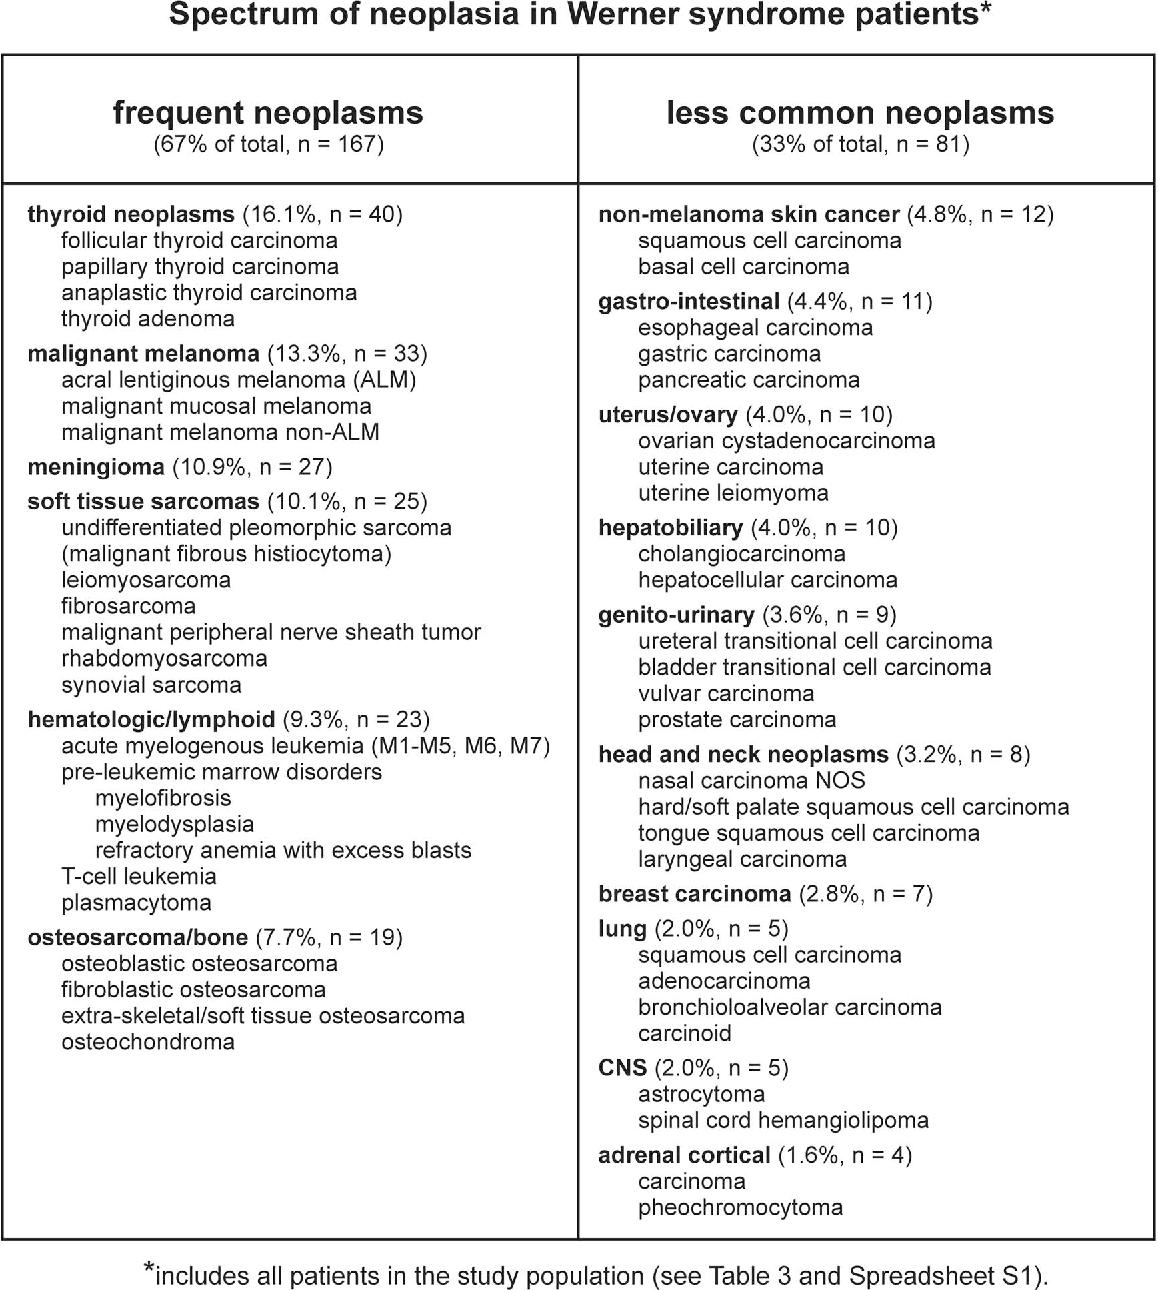 Werner syndrome: description and symptoms 100